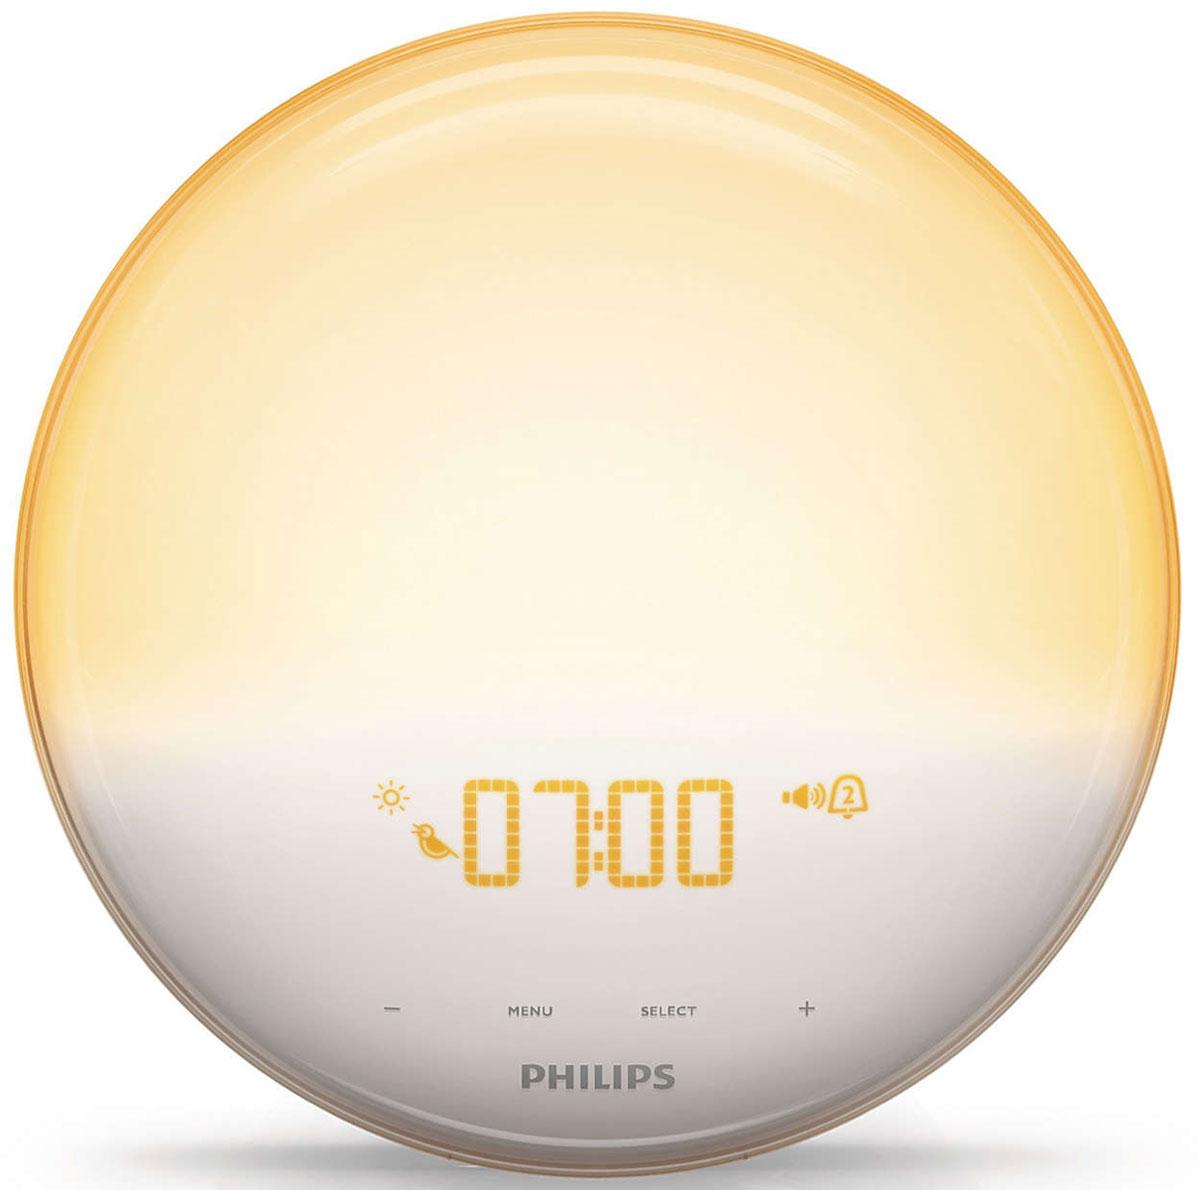 Световой будильник Philips HF3520/70 Wake-up Light philips aj3115 12 радио будильник